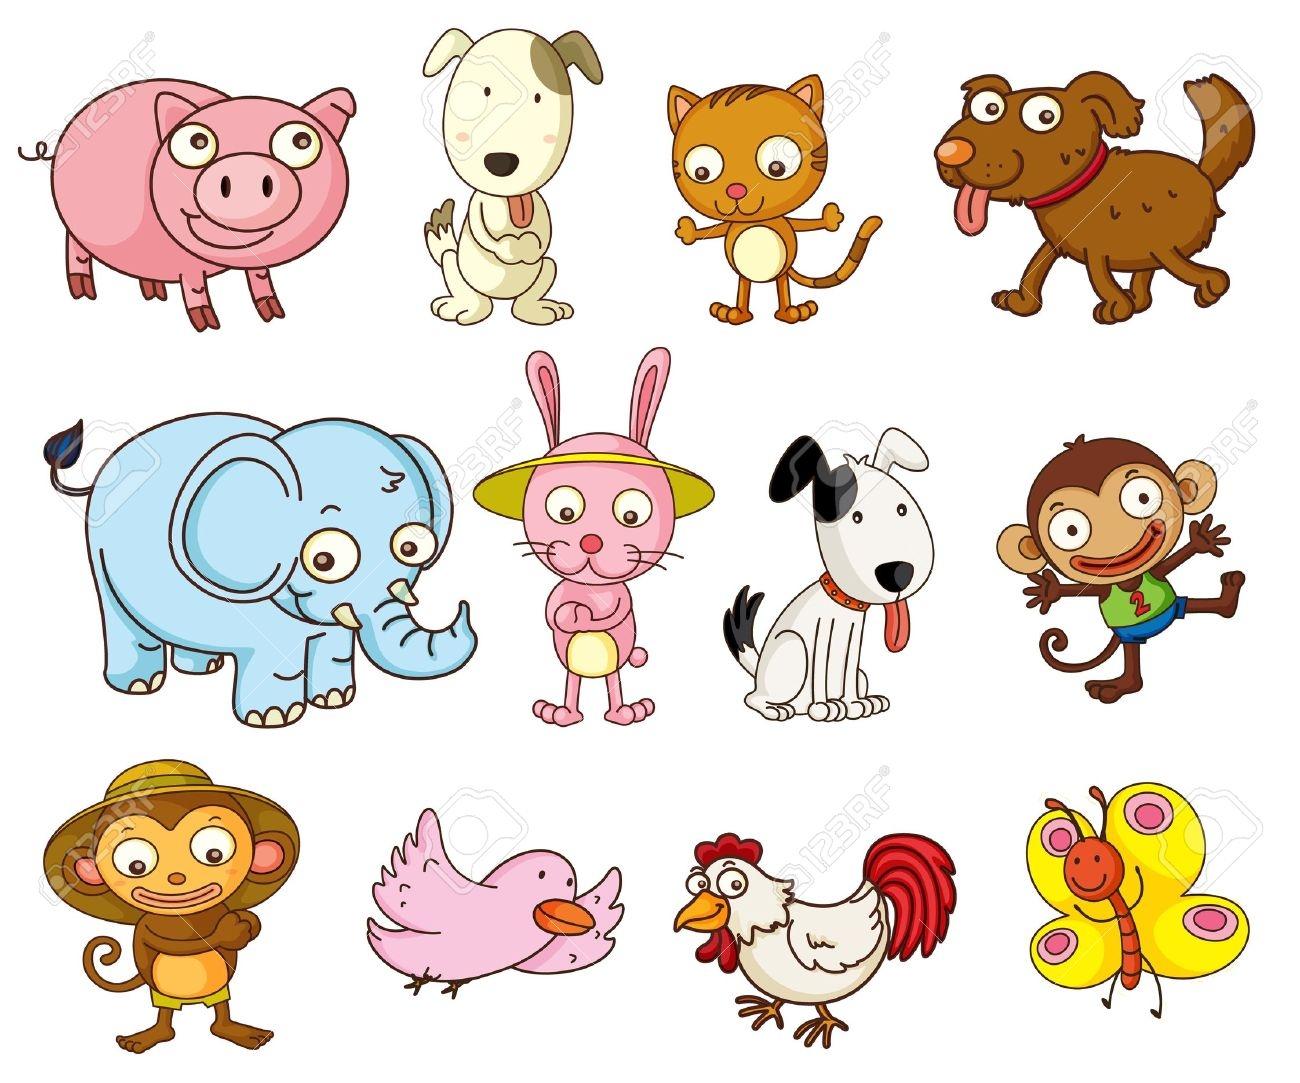 Animal clipart land animal Cartoon Animal animal Cartoon cartoon